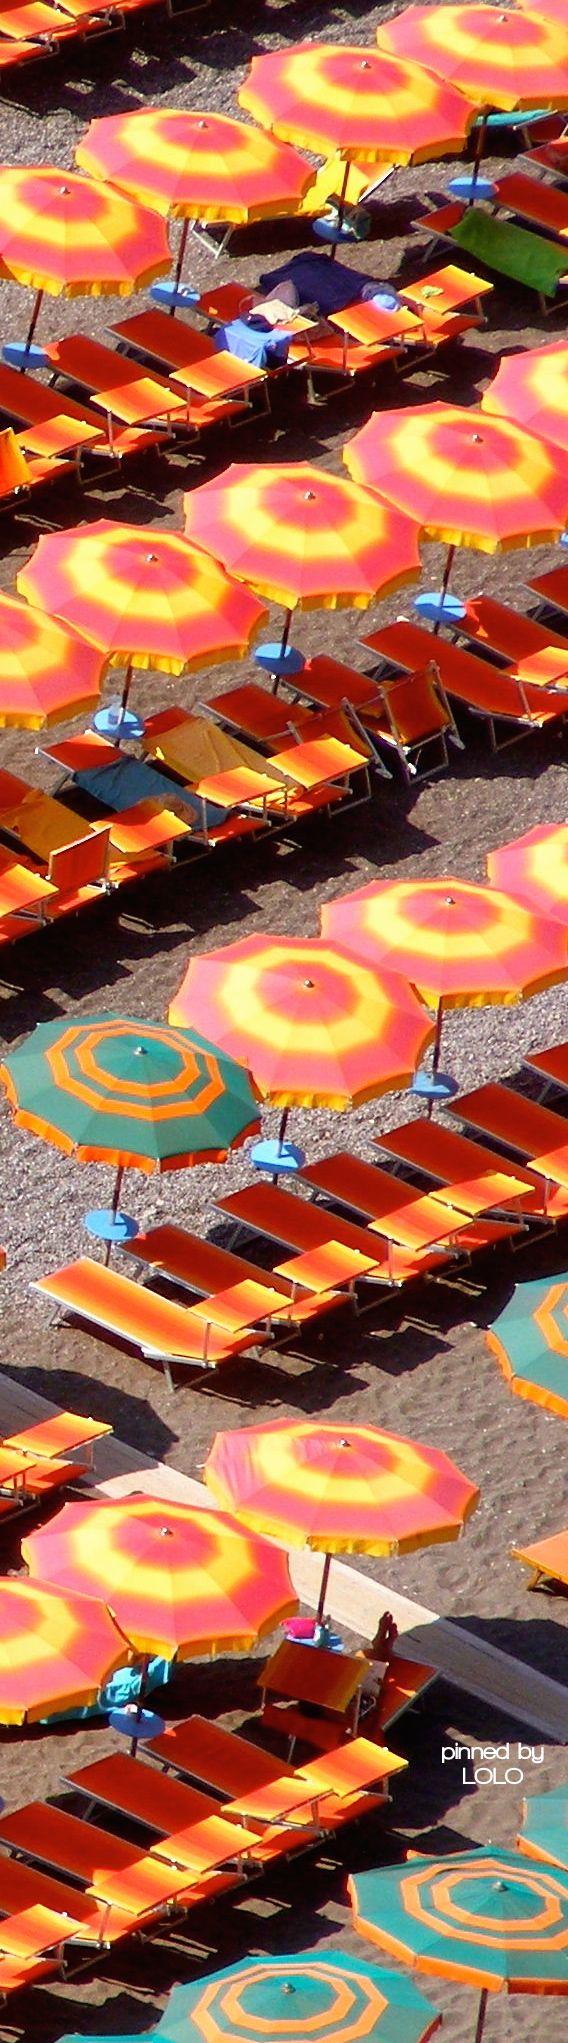 Sorrento on Italy's Amalfi Coast | LOLO